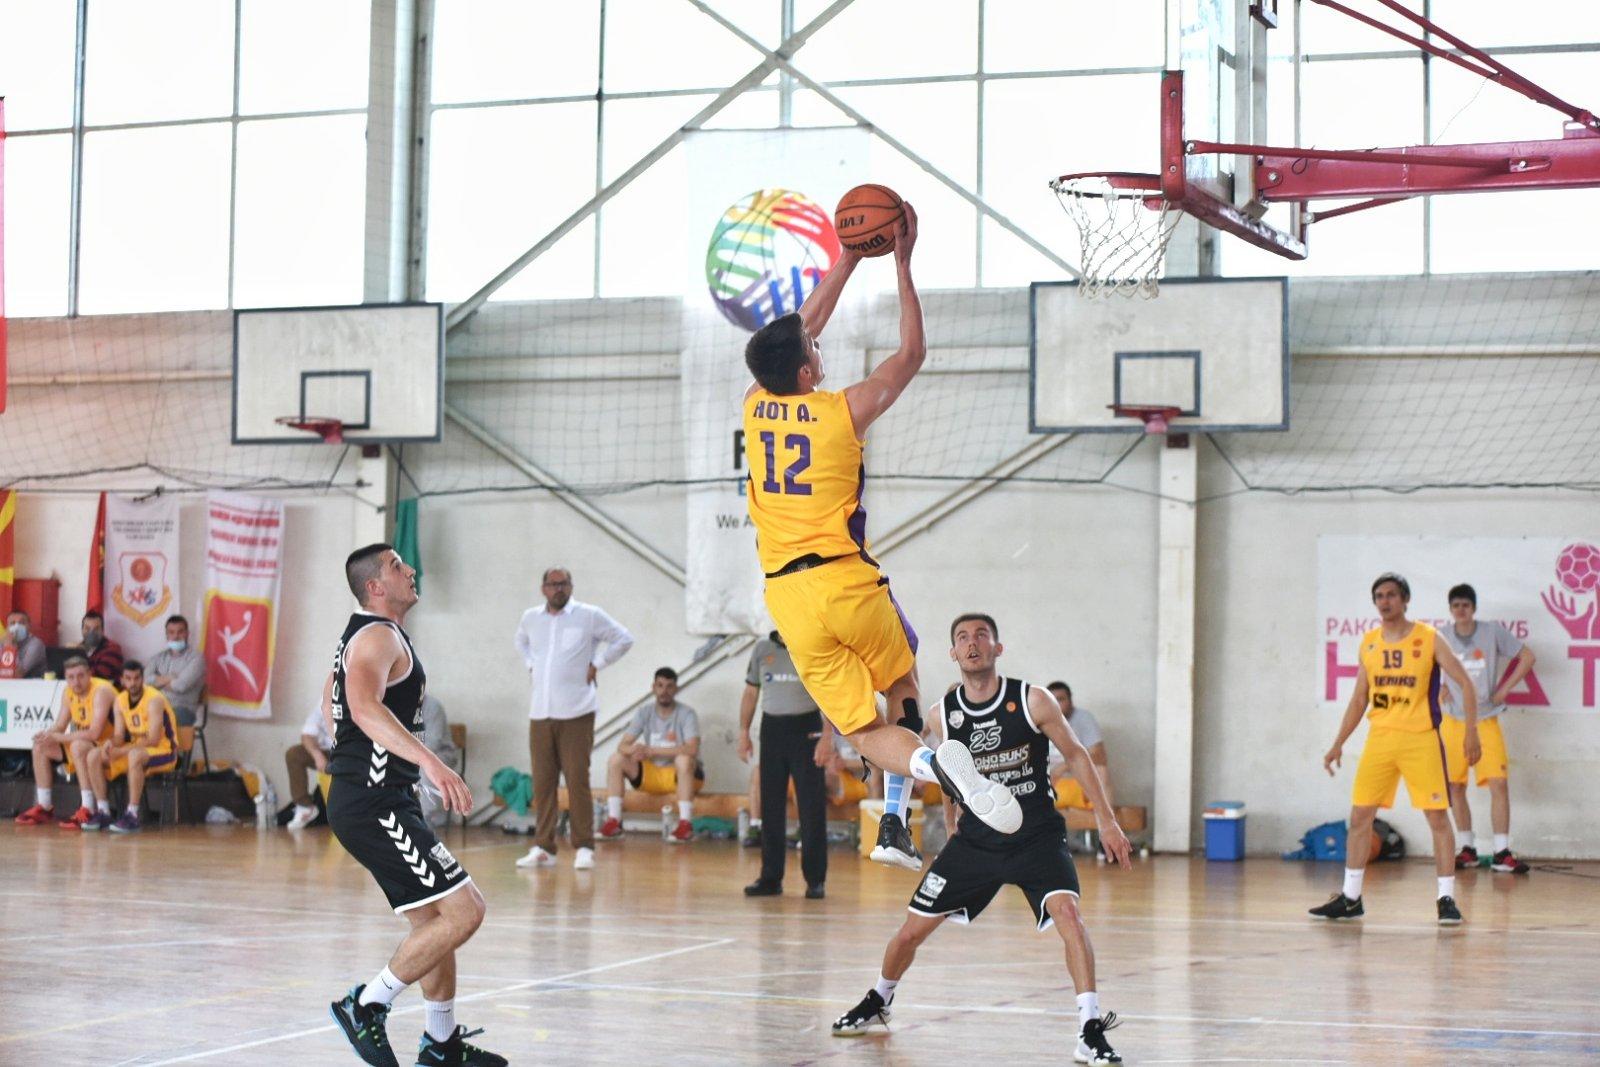 ВТОРА ЛИГА-МАЖИ: Феникс 2010 е на чекор до место во Првата лига